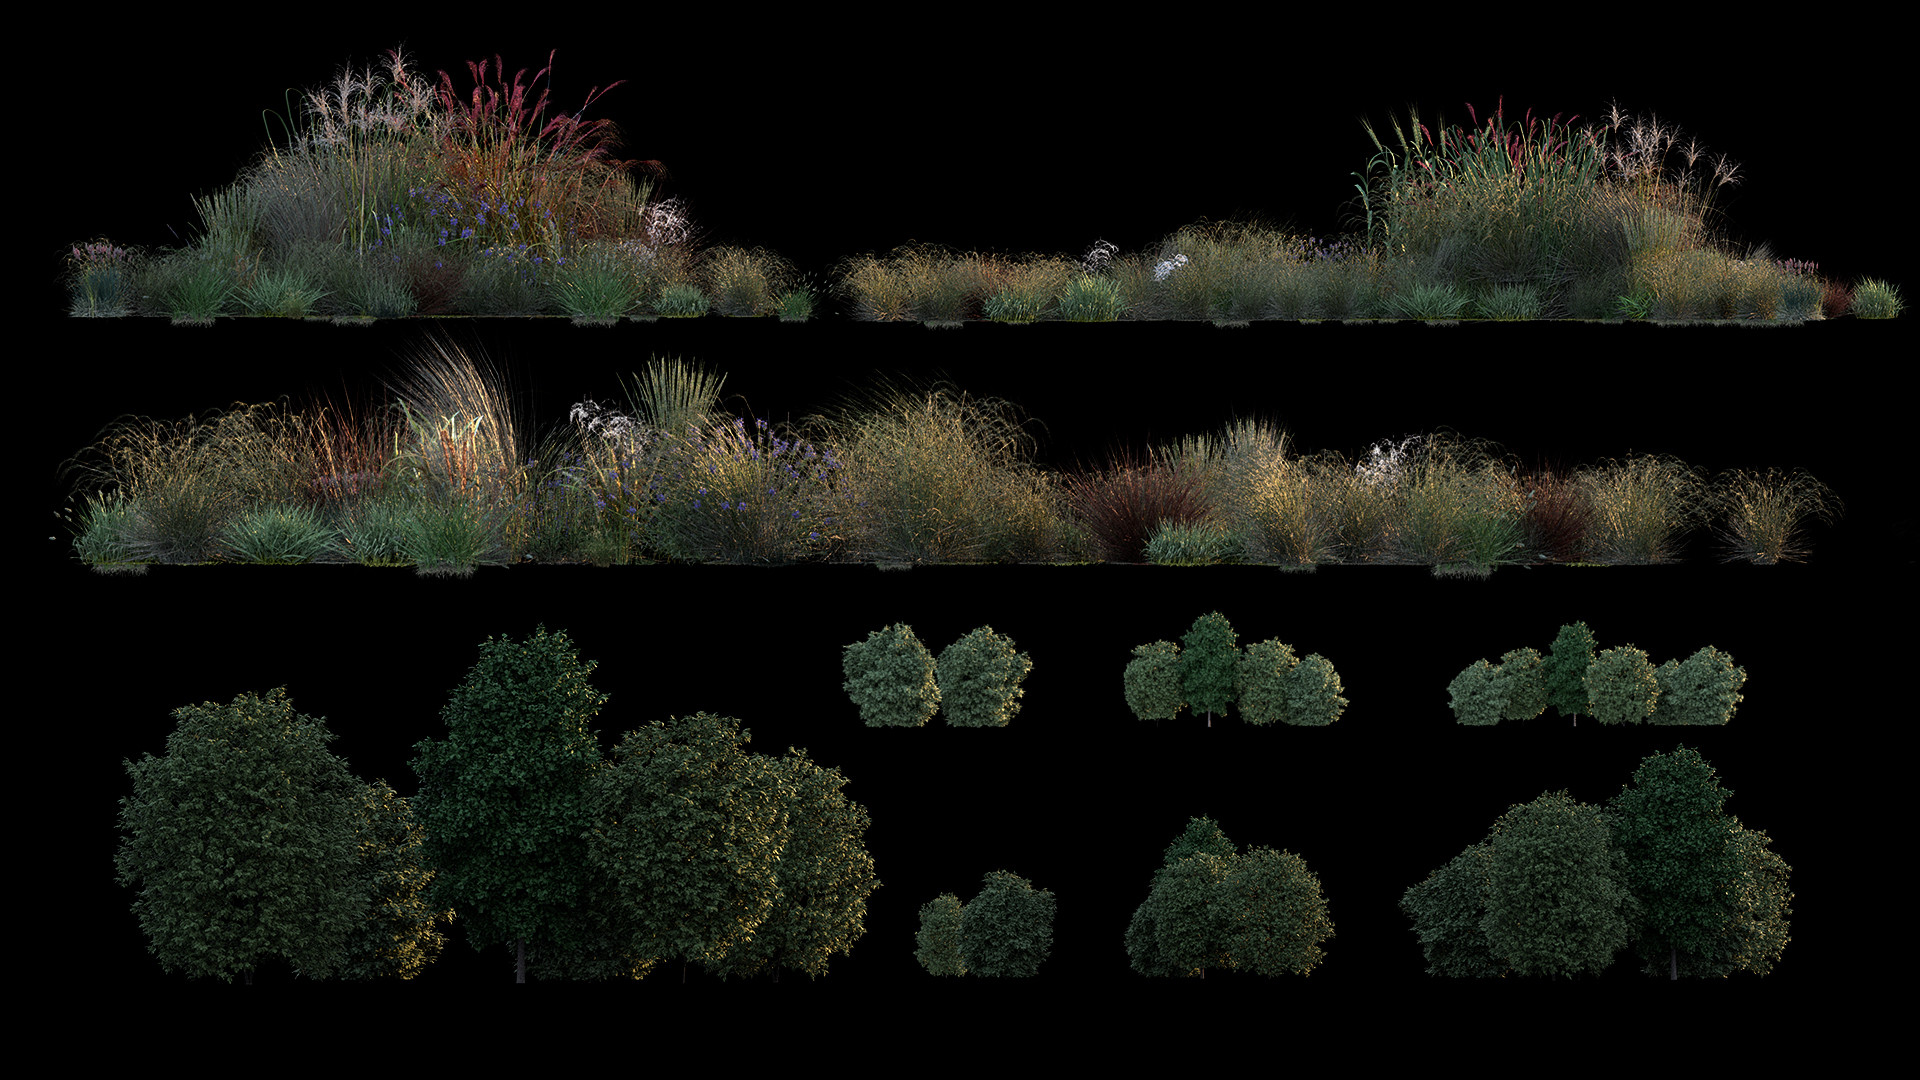 Benjamin bardou 005 vegetation